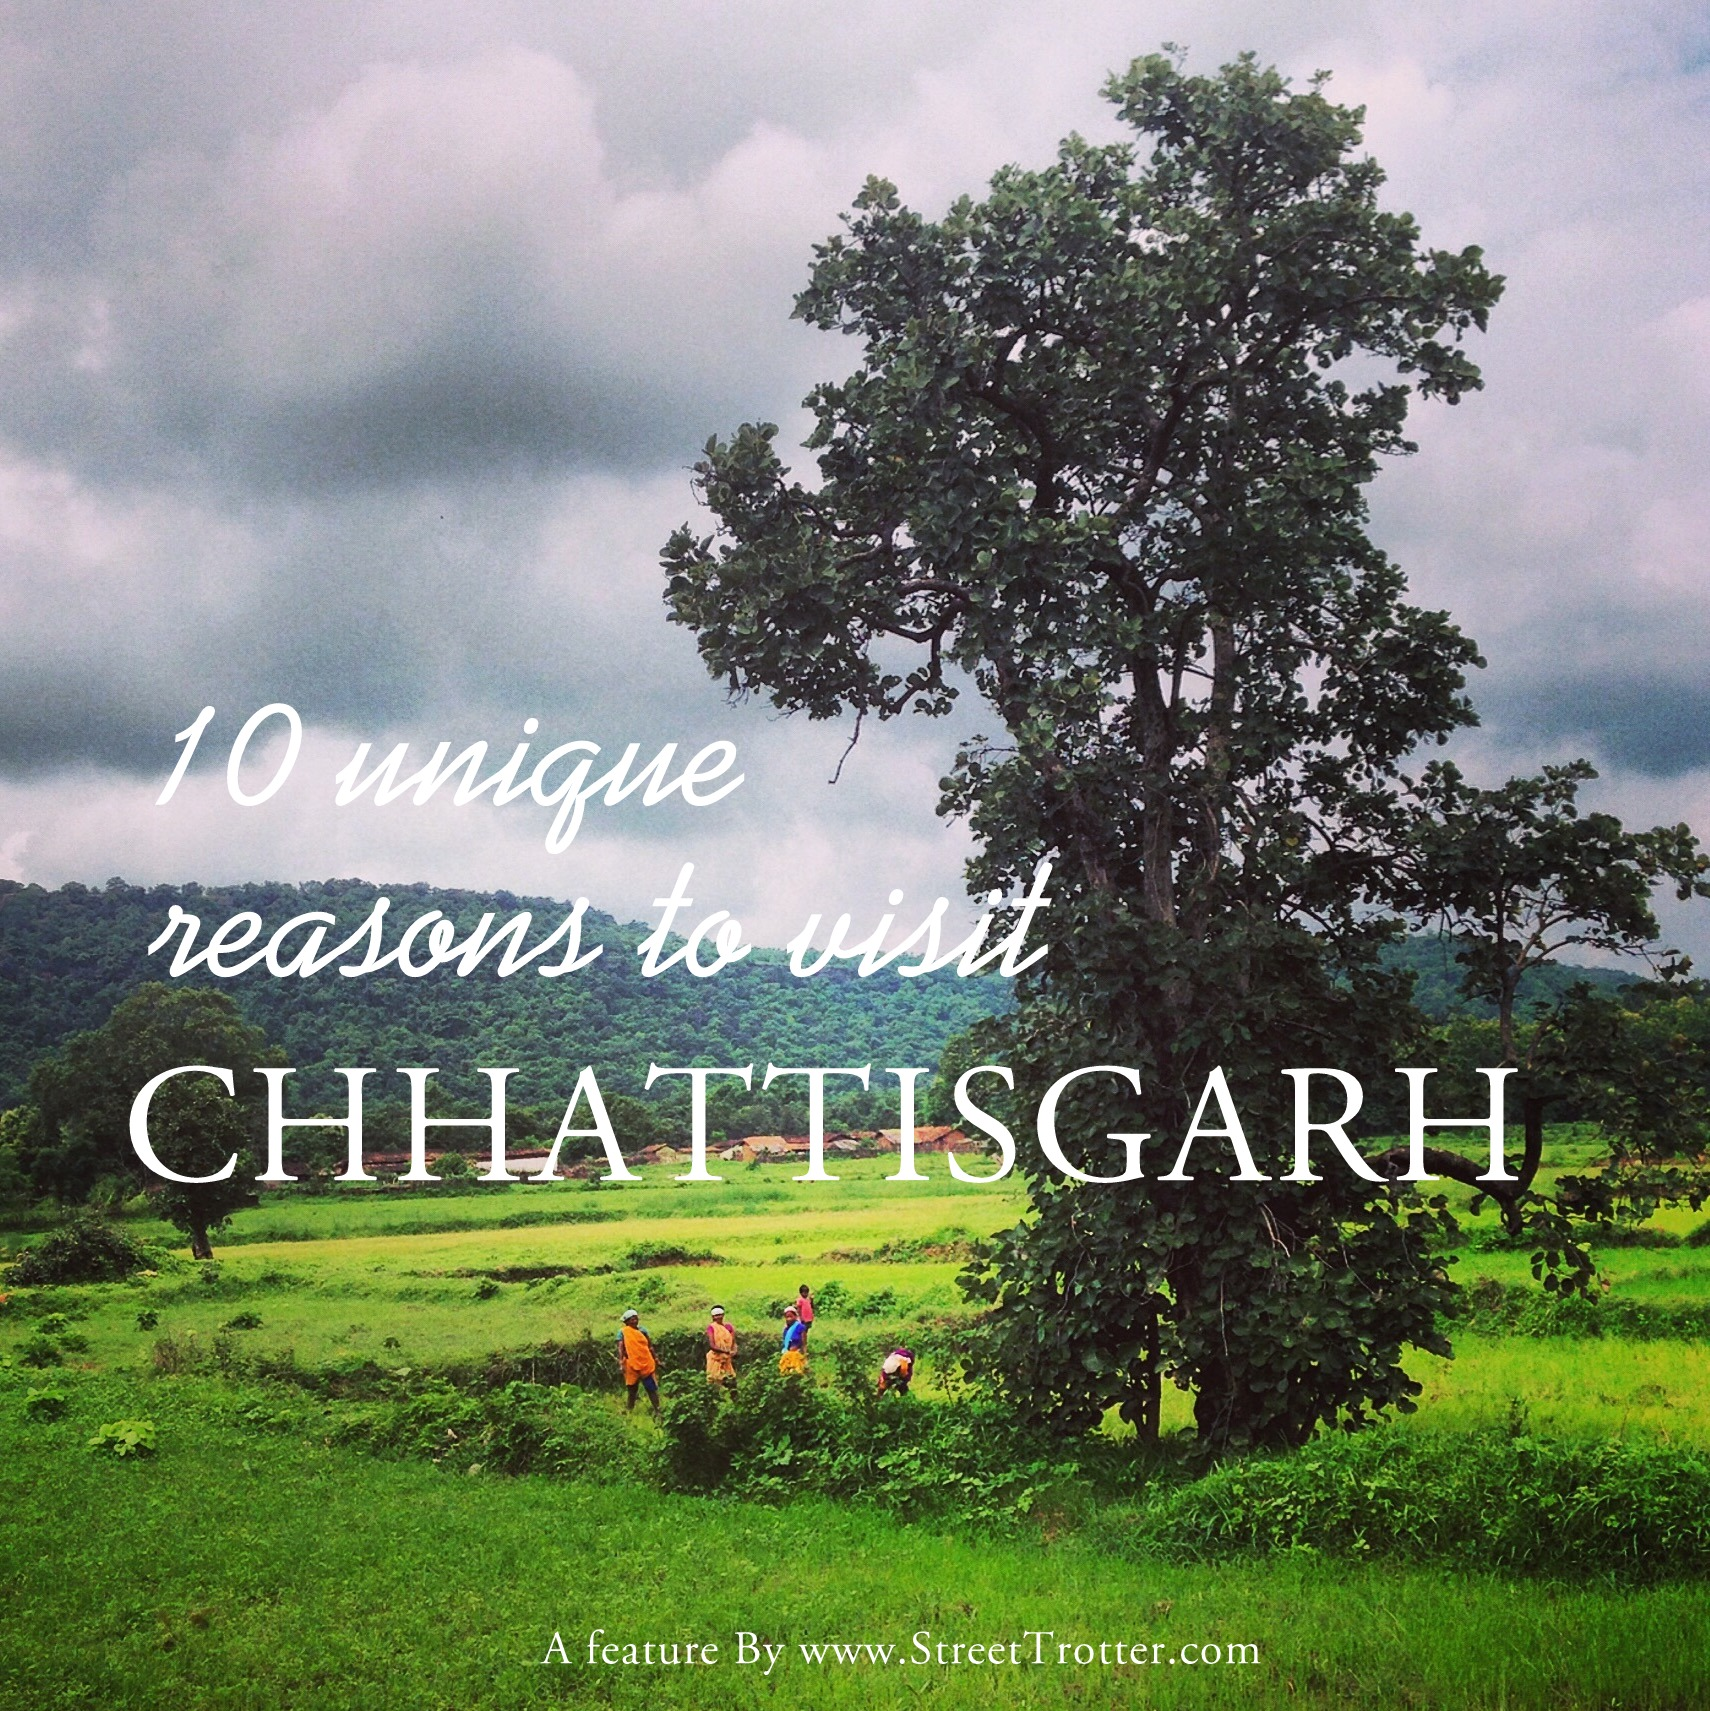 STREETTROTTER CHHATTISGARH #TWC2015